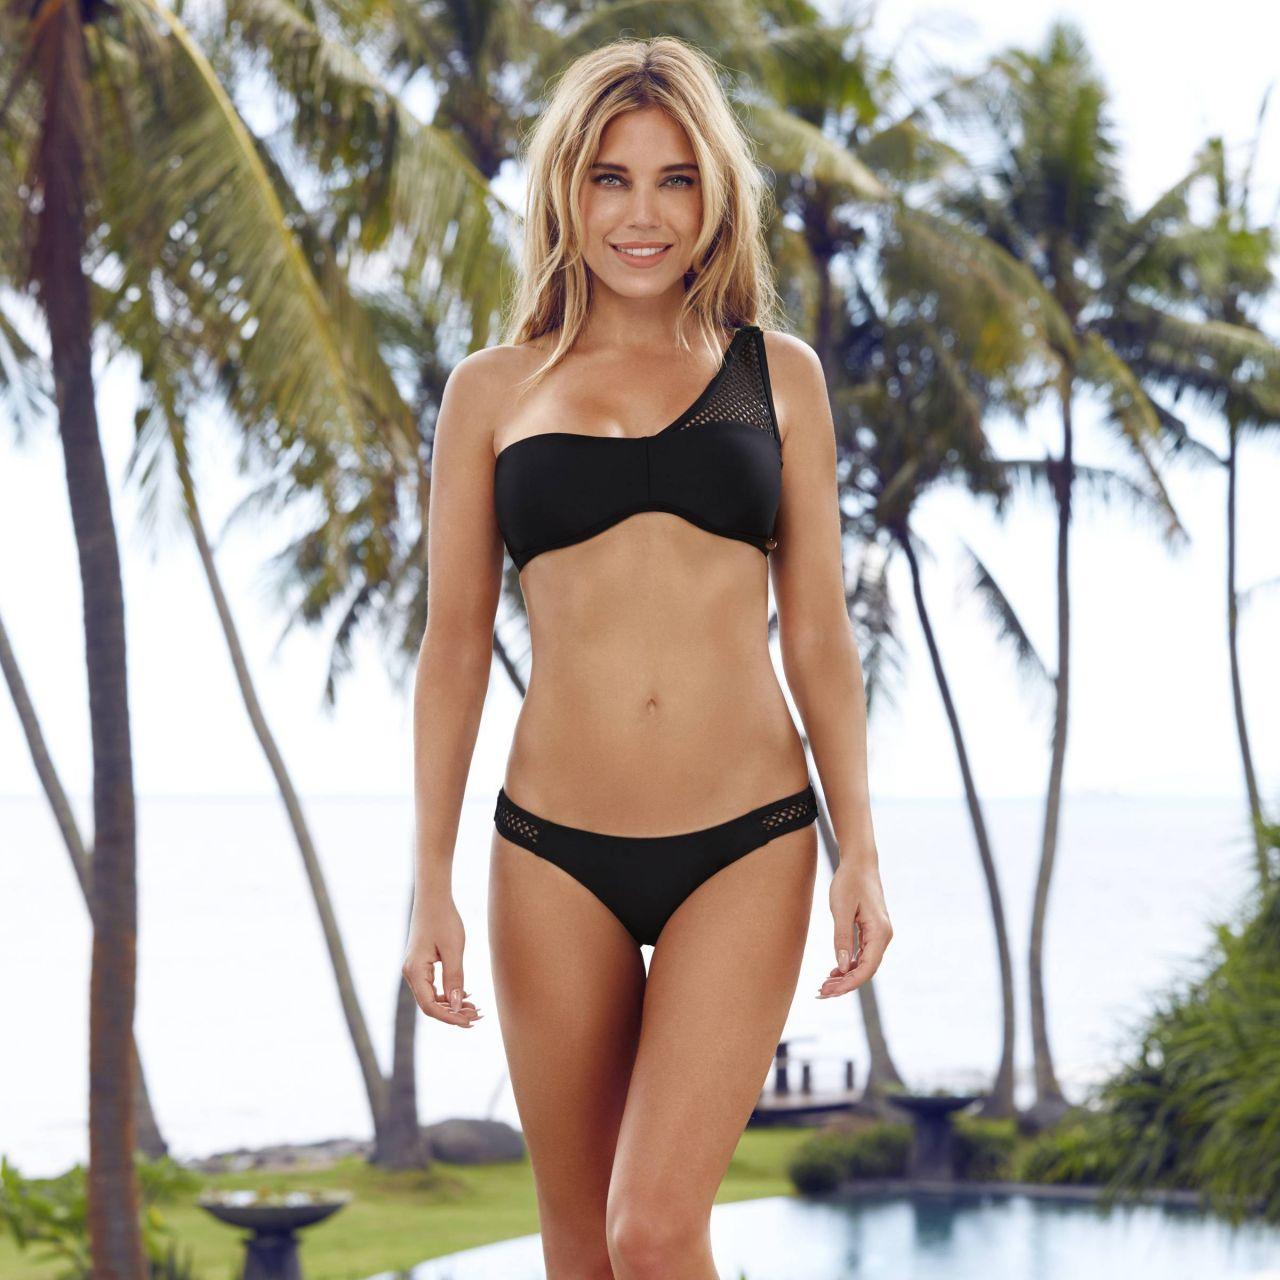 Sylvie Meis Hot in a Bikini